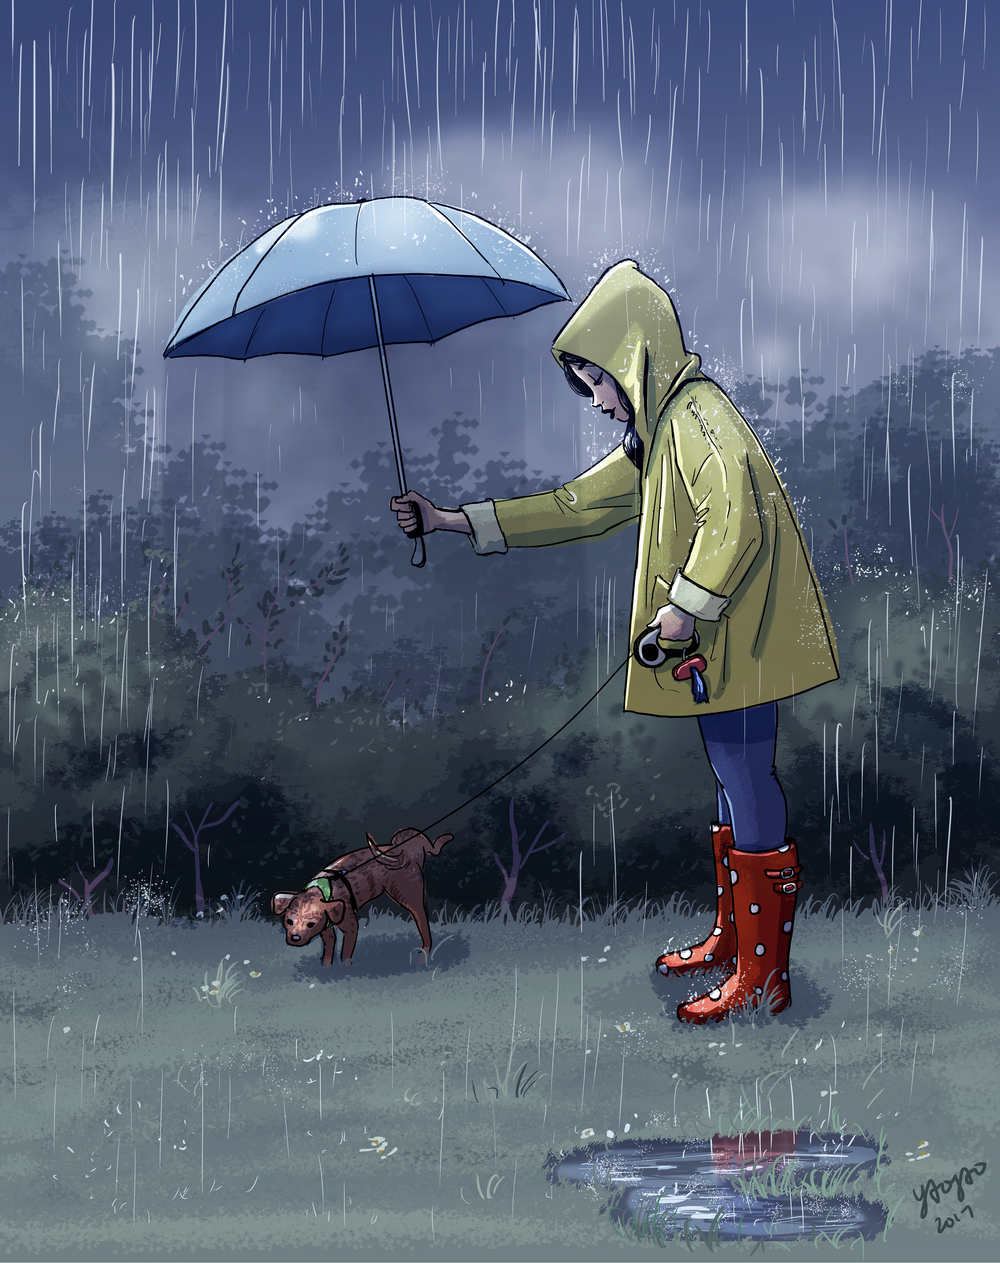 Mia Swan Adli Kullanicinin Fantastik Kadin Panosundaki Pin Resimler Illustrasyonlar Illustration